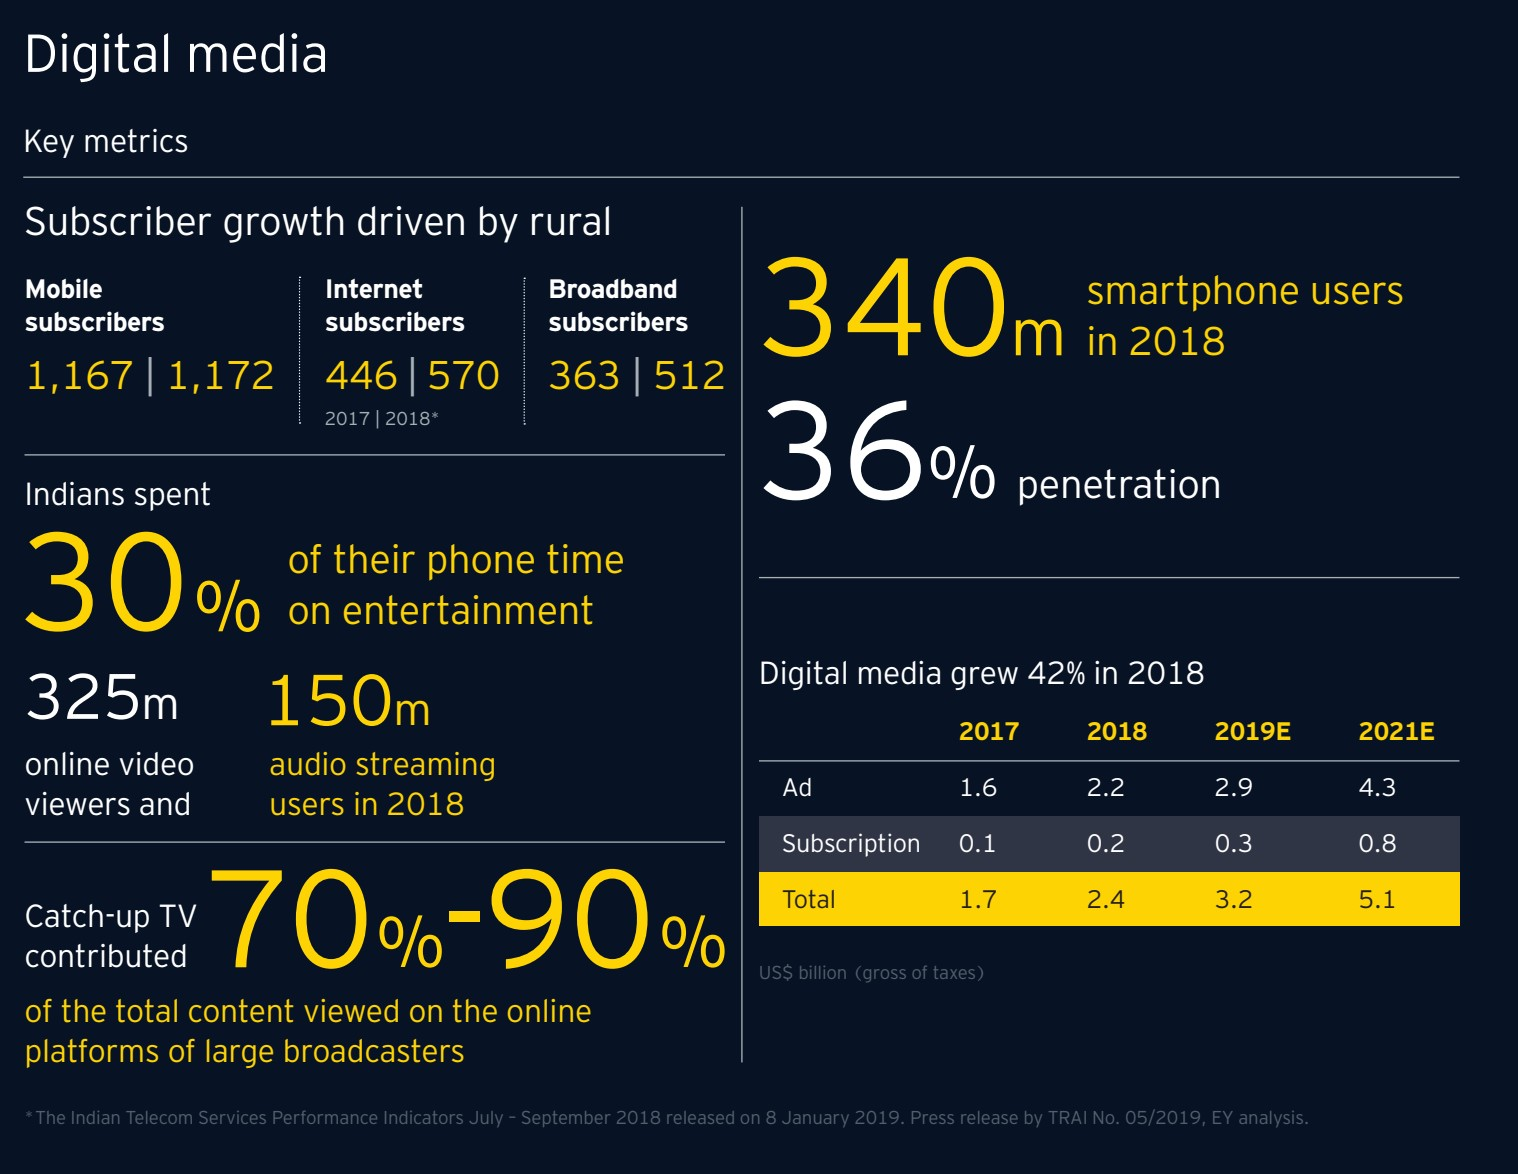 E & Y Report 2019 - Digital media